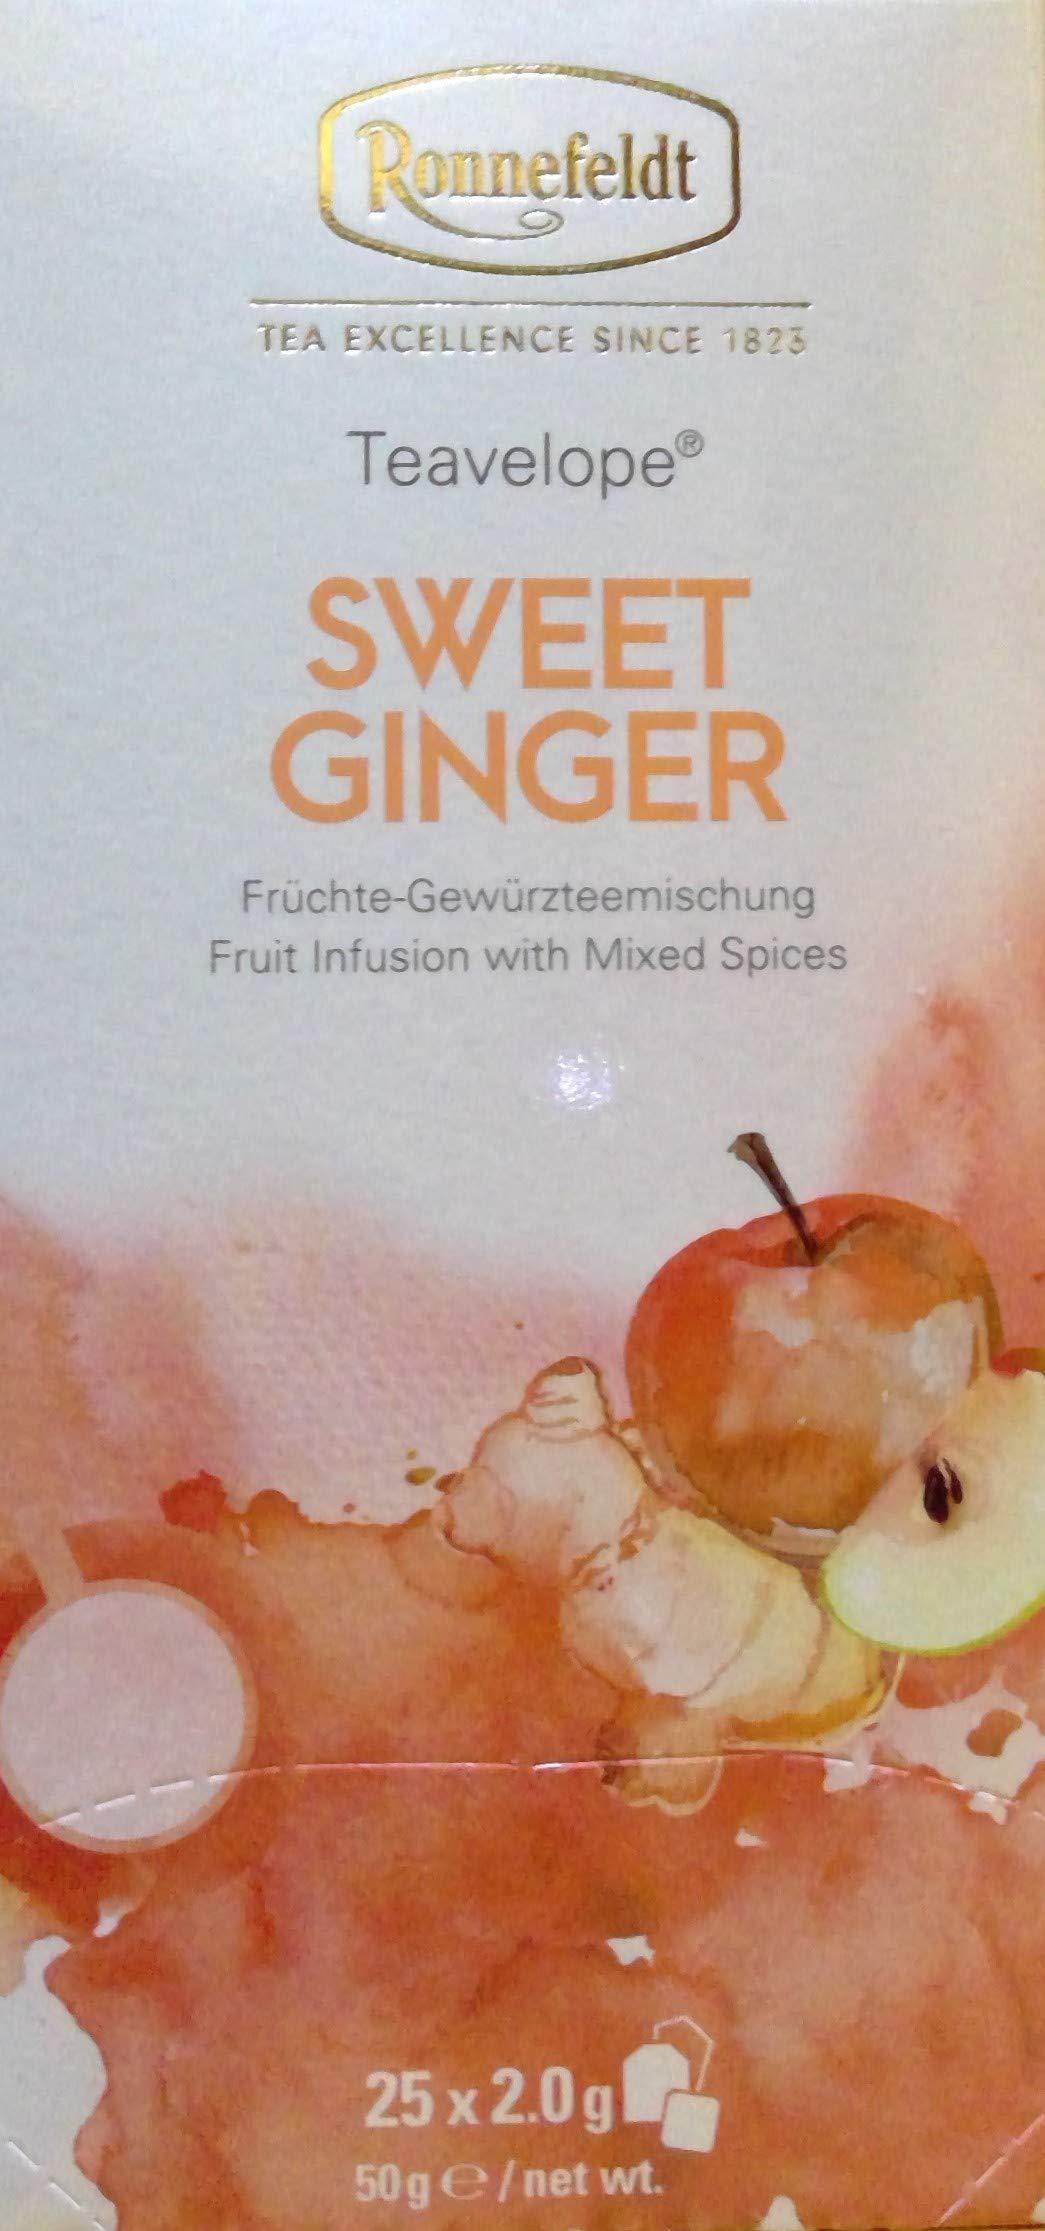 Ronnefeldt-Teavelope-Sweet-Ginger-Frchte-Gewrzteemischung-Teebeutel-25-x-20-g